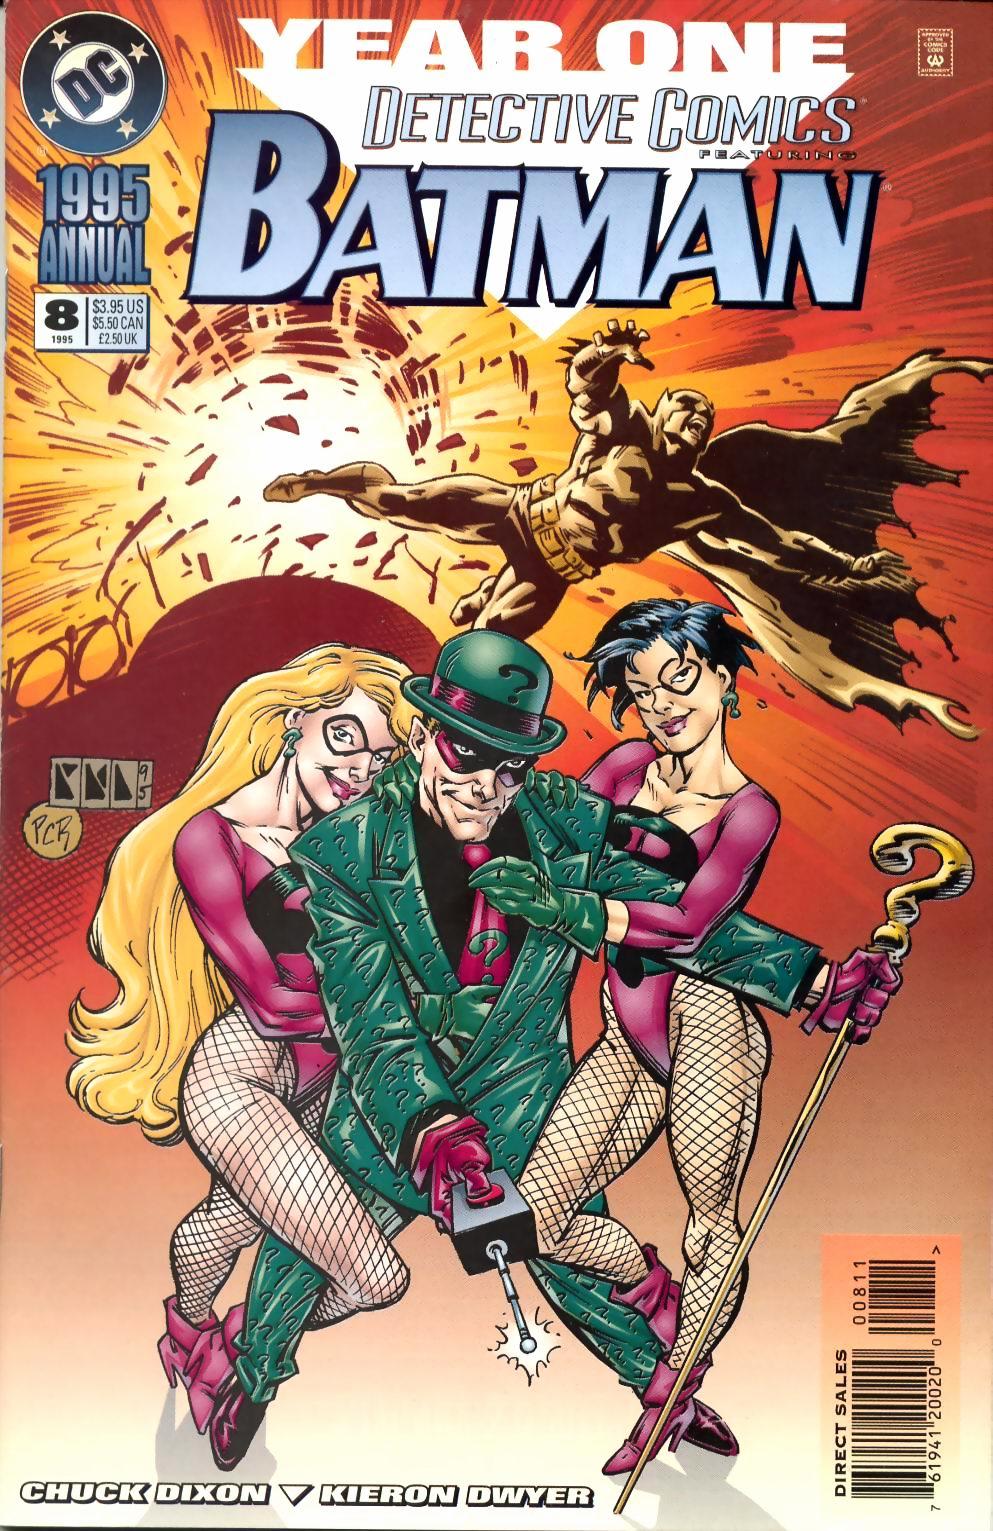 Batman: Four of a Kind 2_Detective_Comics_Annual Page 1